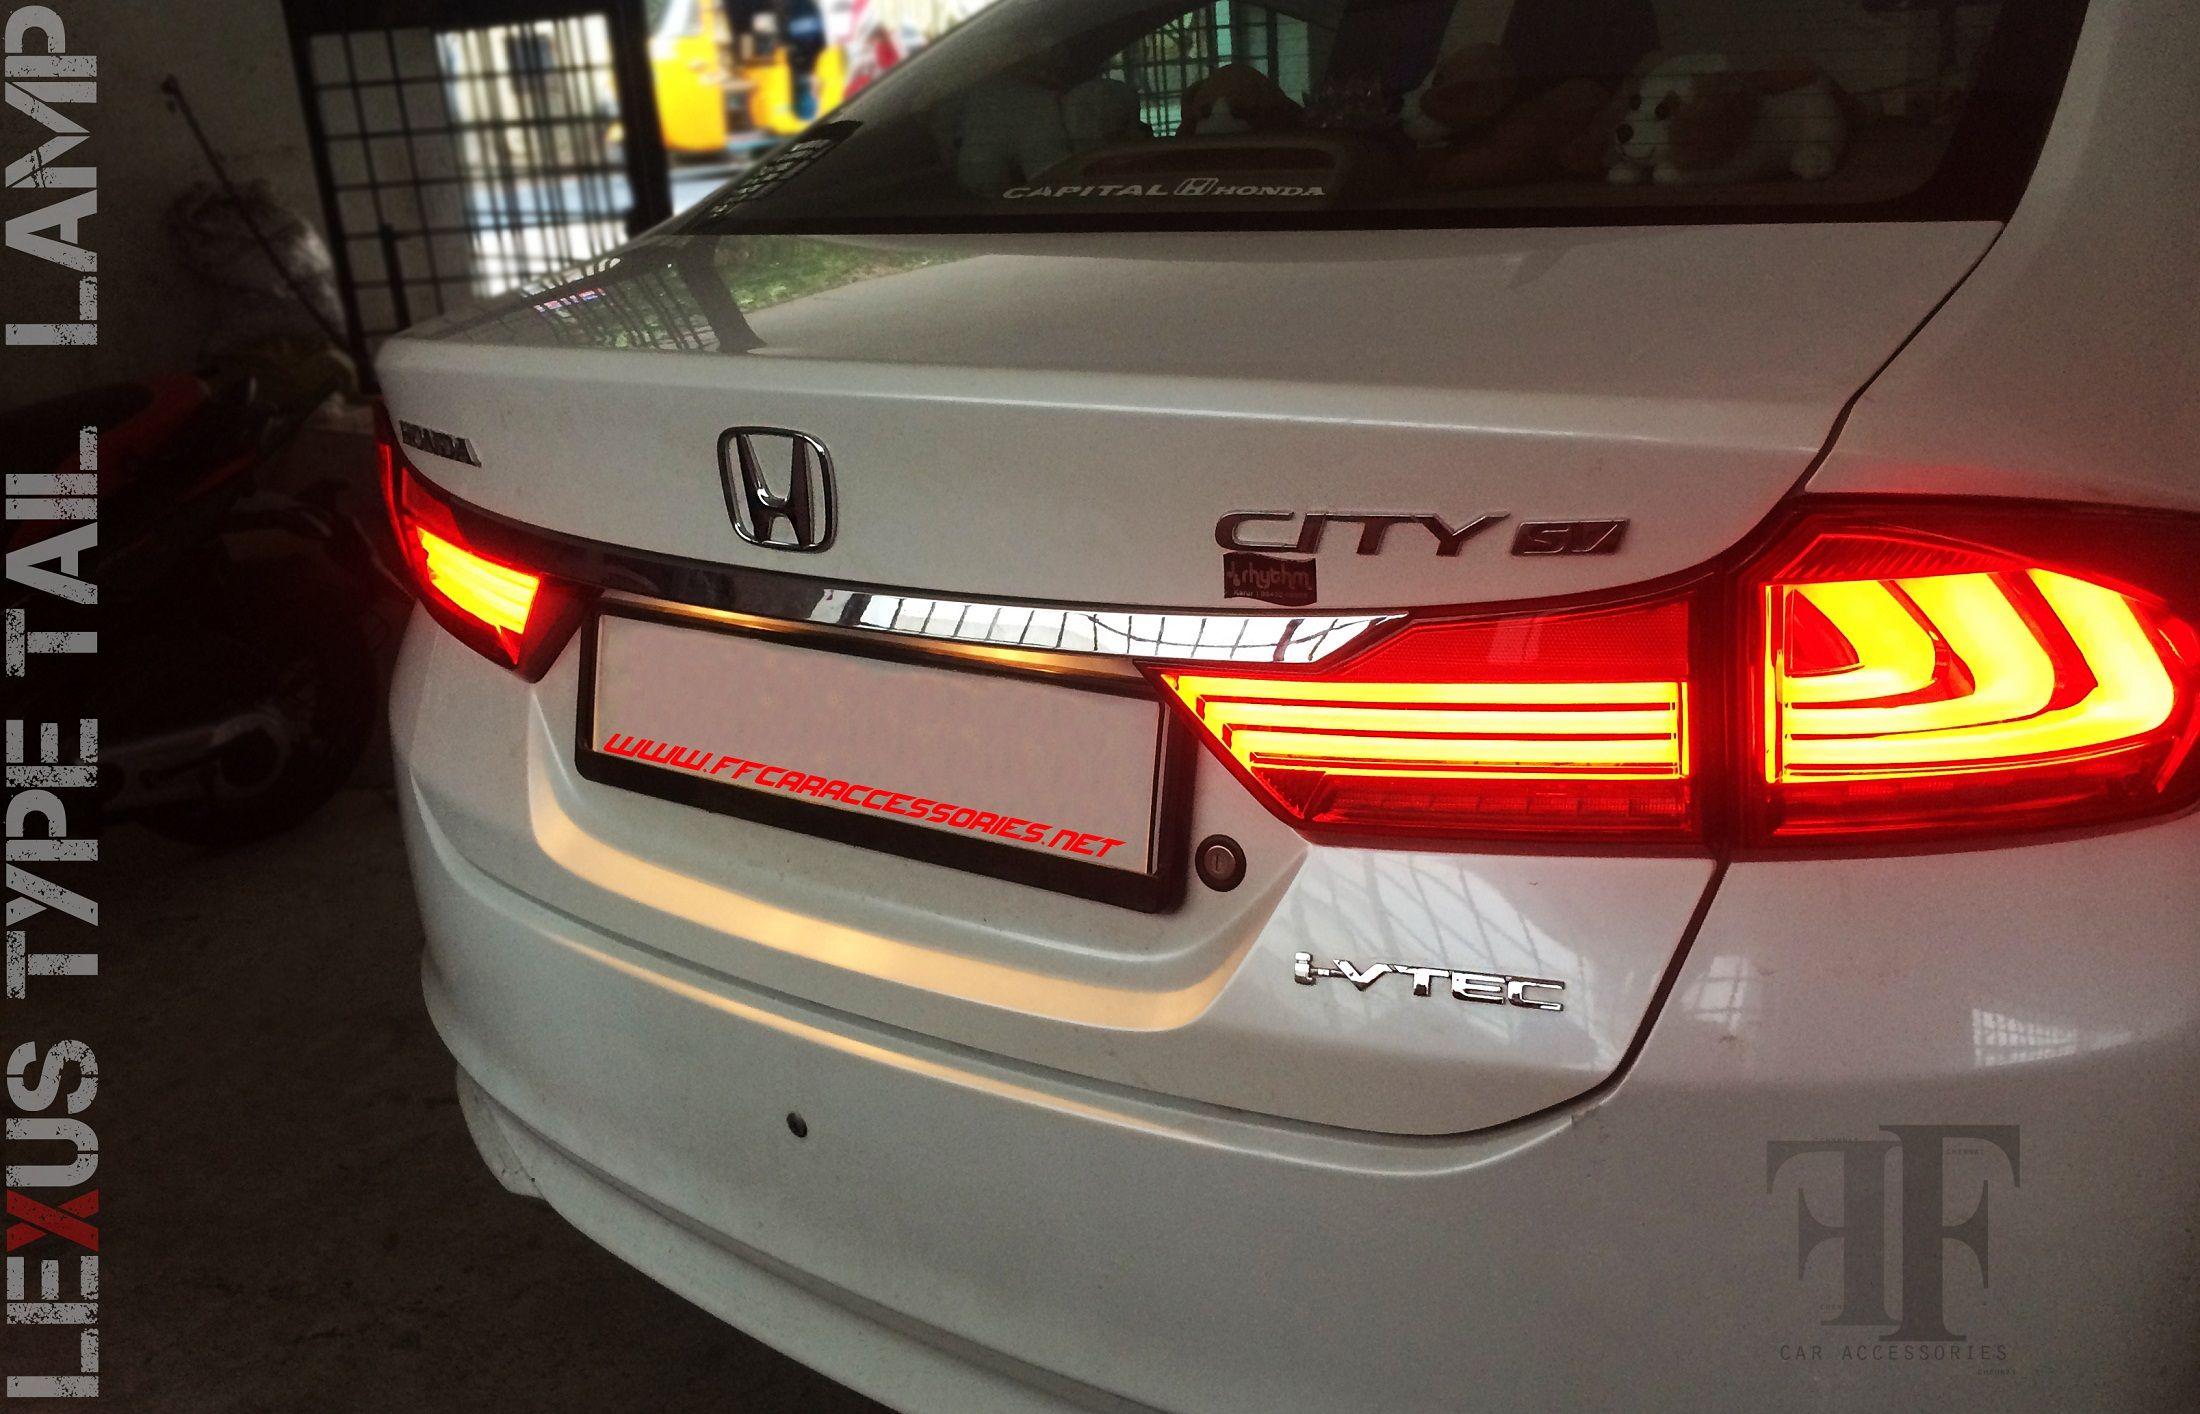 lexus type tail lamp conversion on Honda city Car